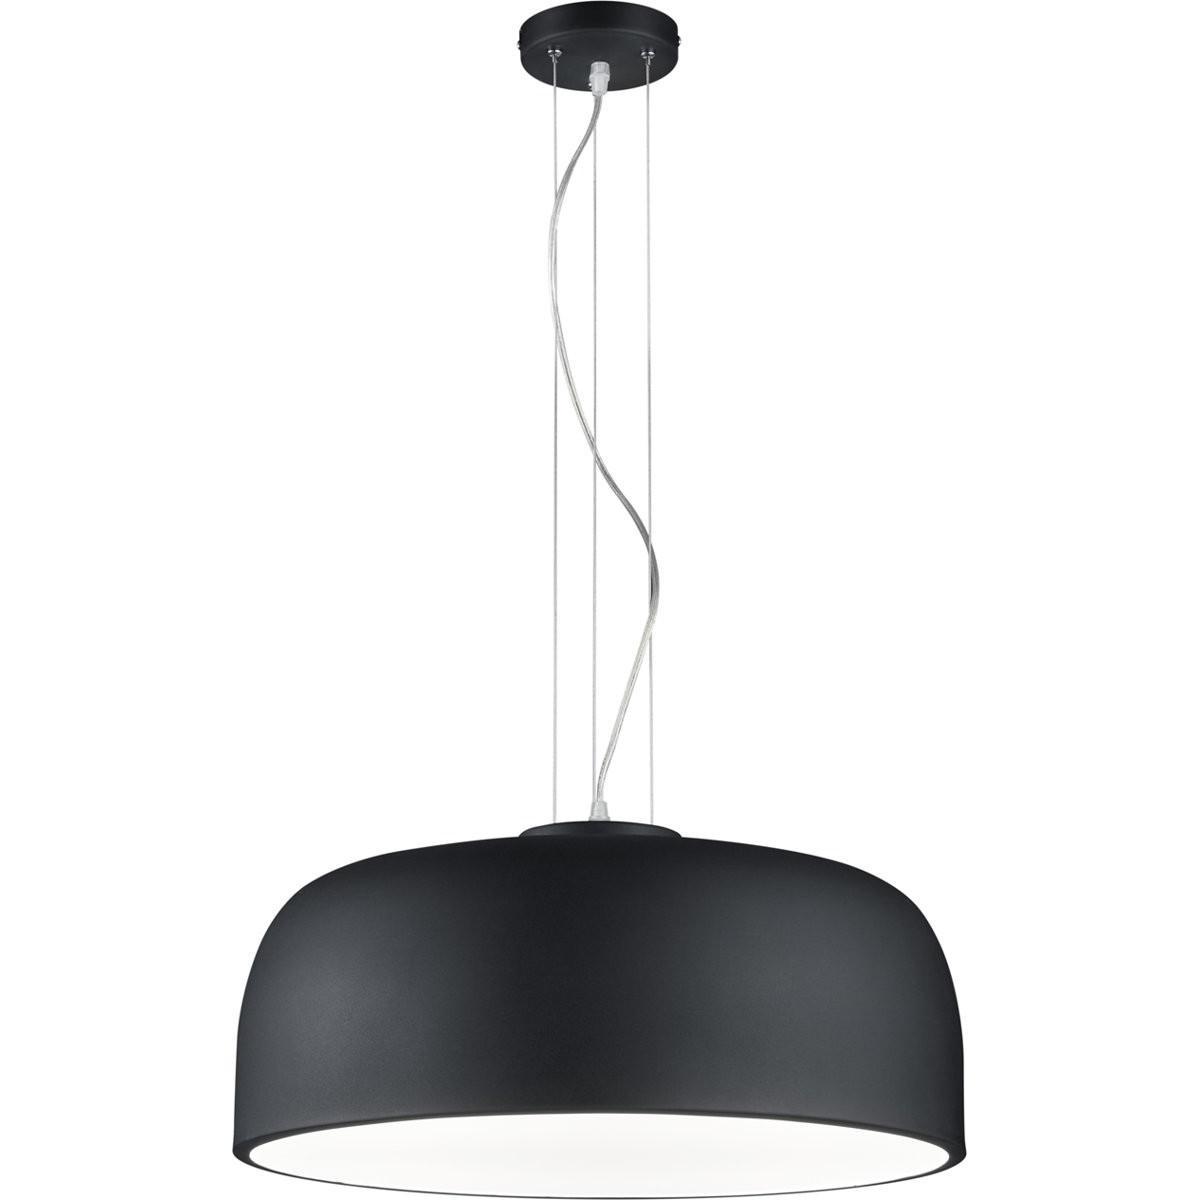 LED Hanglamp - Trion Barnon - E27 Fitting - 4-lichts - Rond - Mat Zwart Aluminium